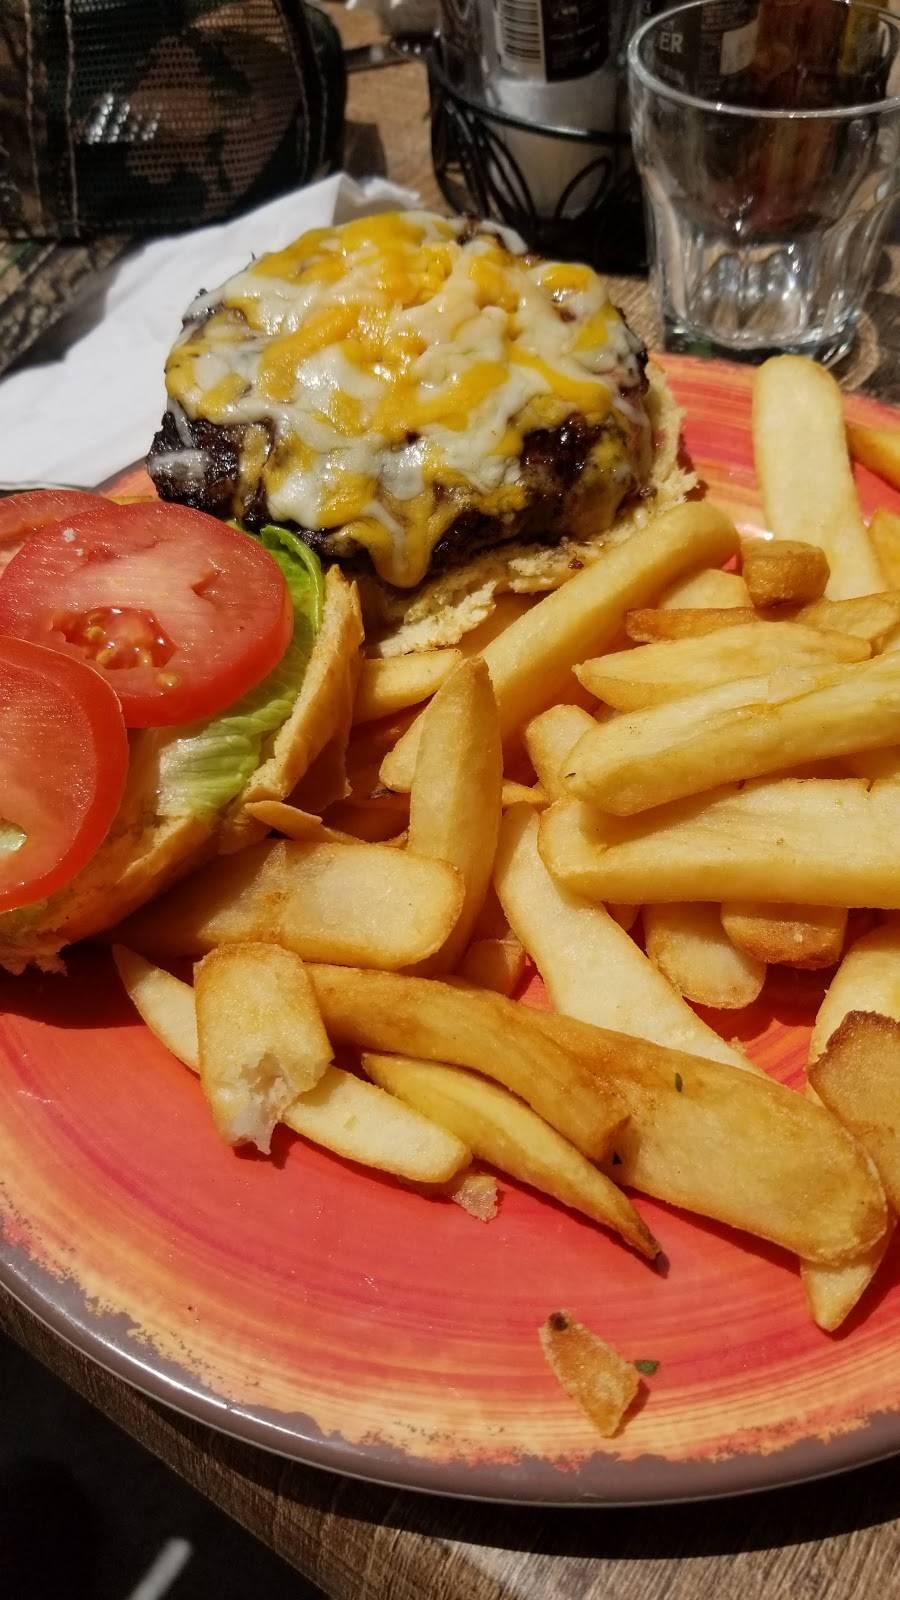 El Jefe Gordo | restaurant | 251 Rehoboth Ave, Rehoboth Beach, DE 19971, USA | 3022125631 OR +1 302-212-5631